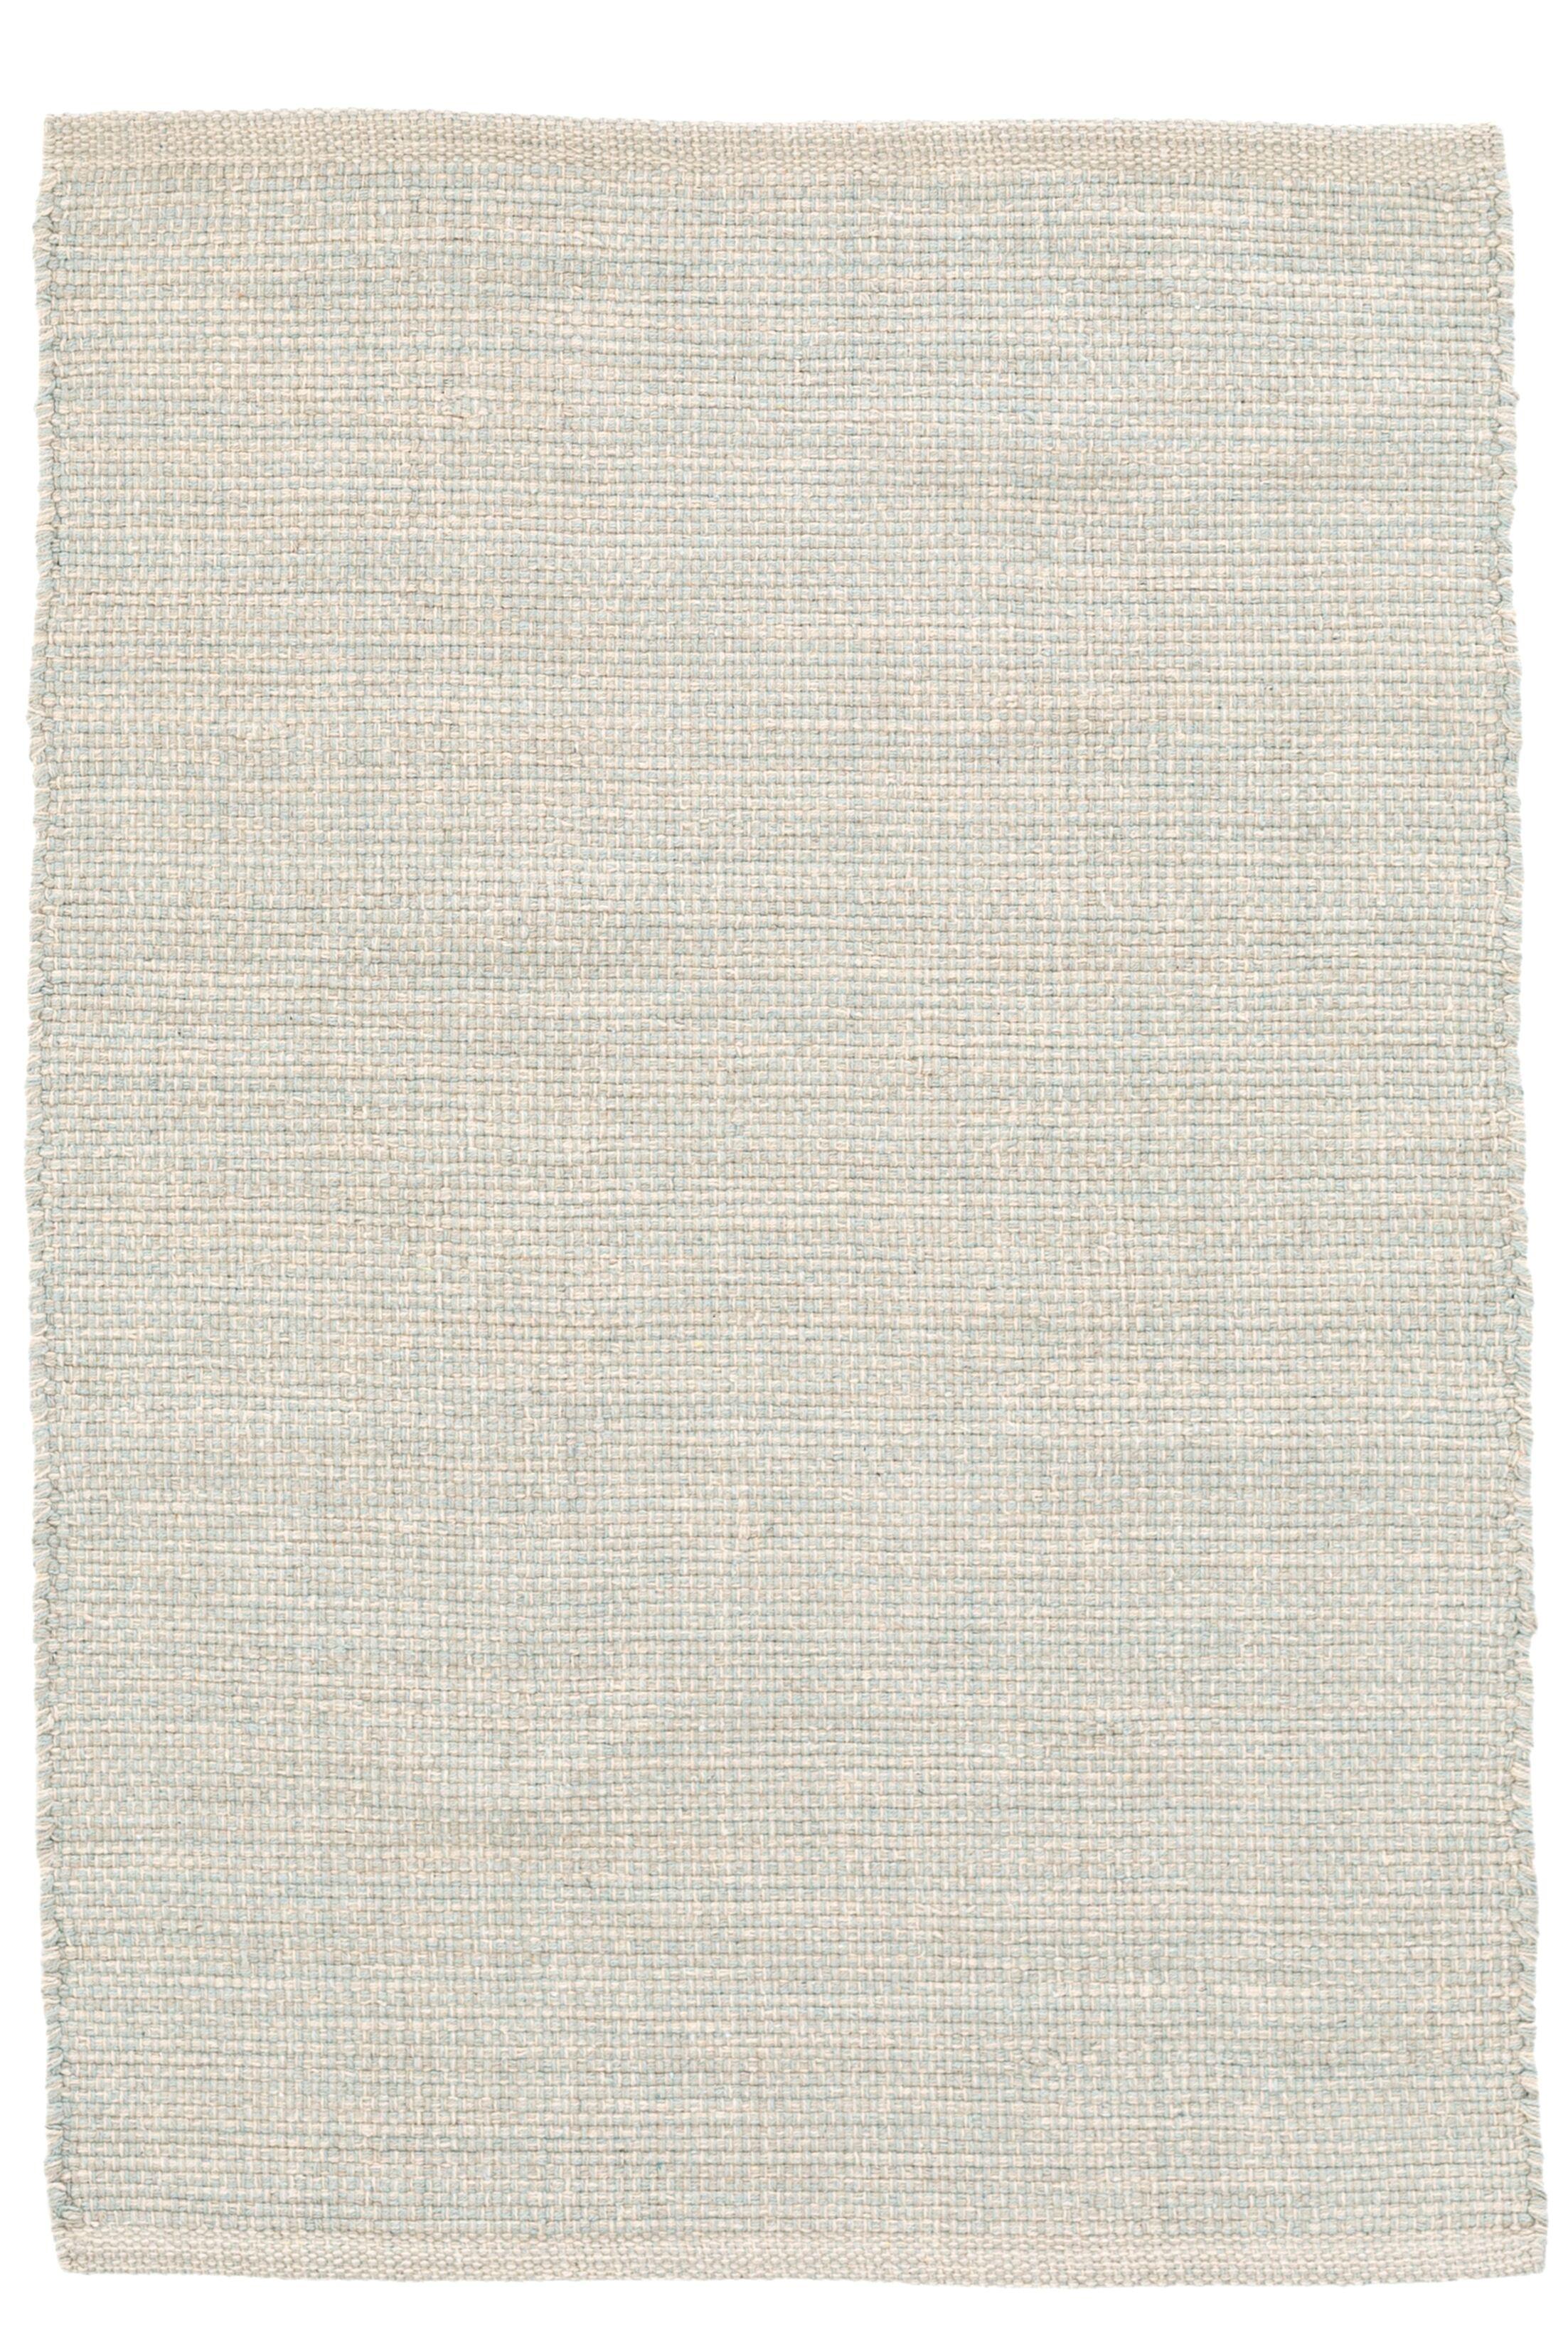 Marled Blue/White Area Rug Rug Size: Rectangle 10' x 14'